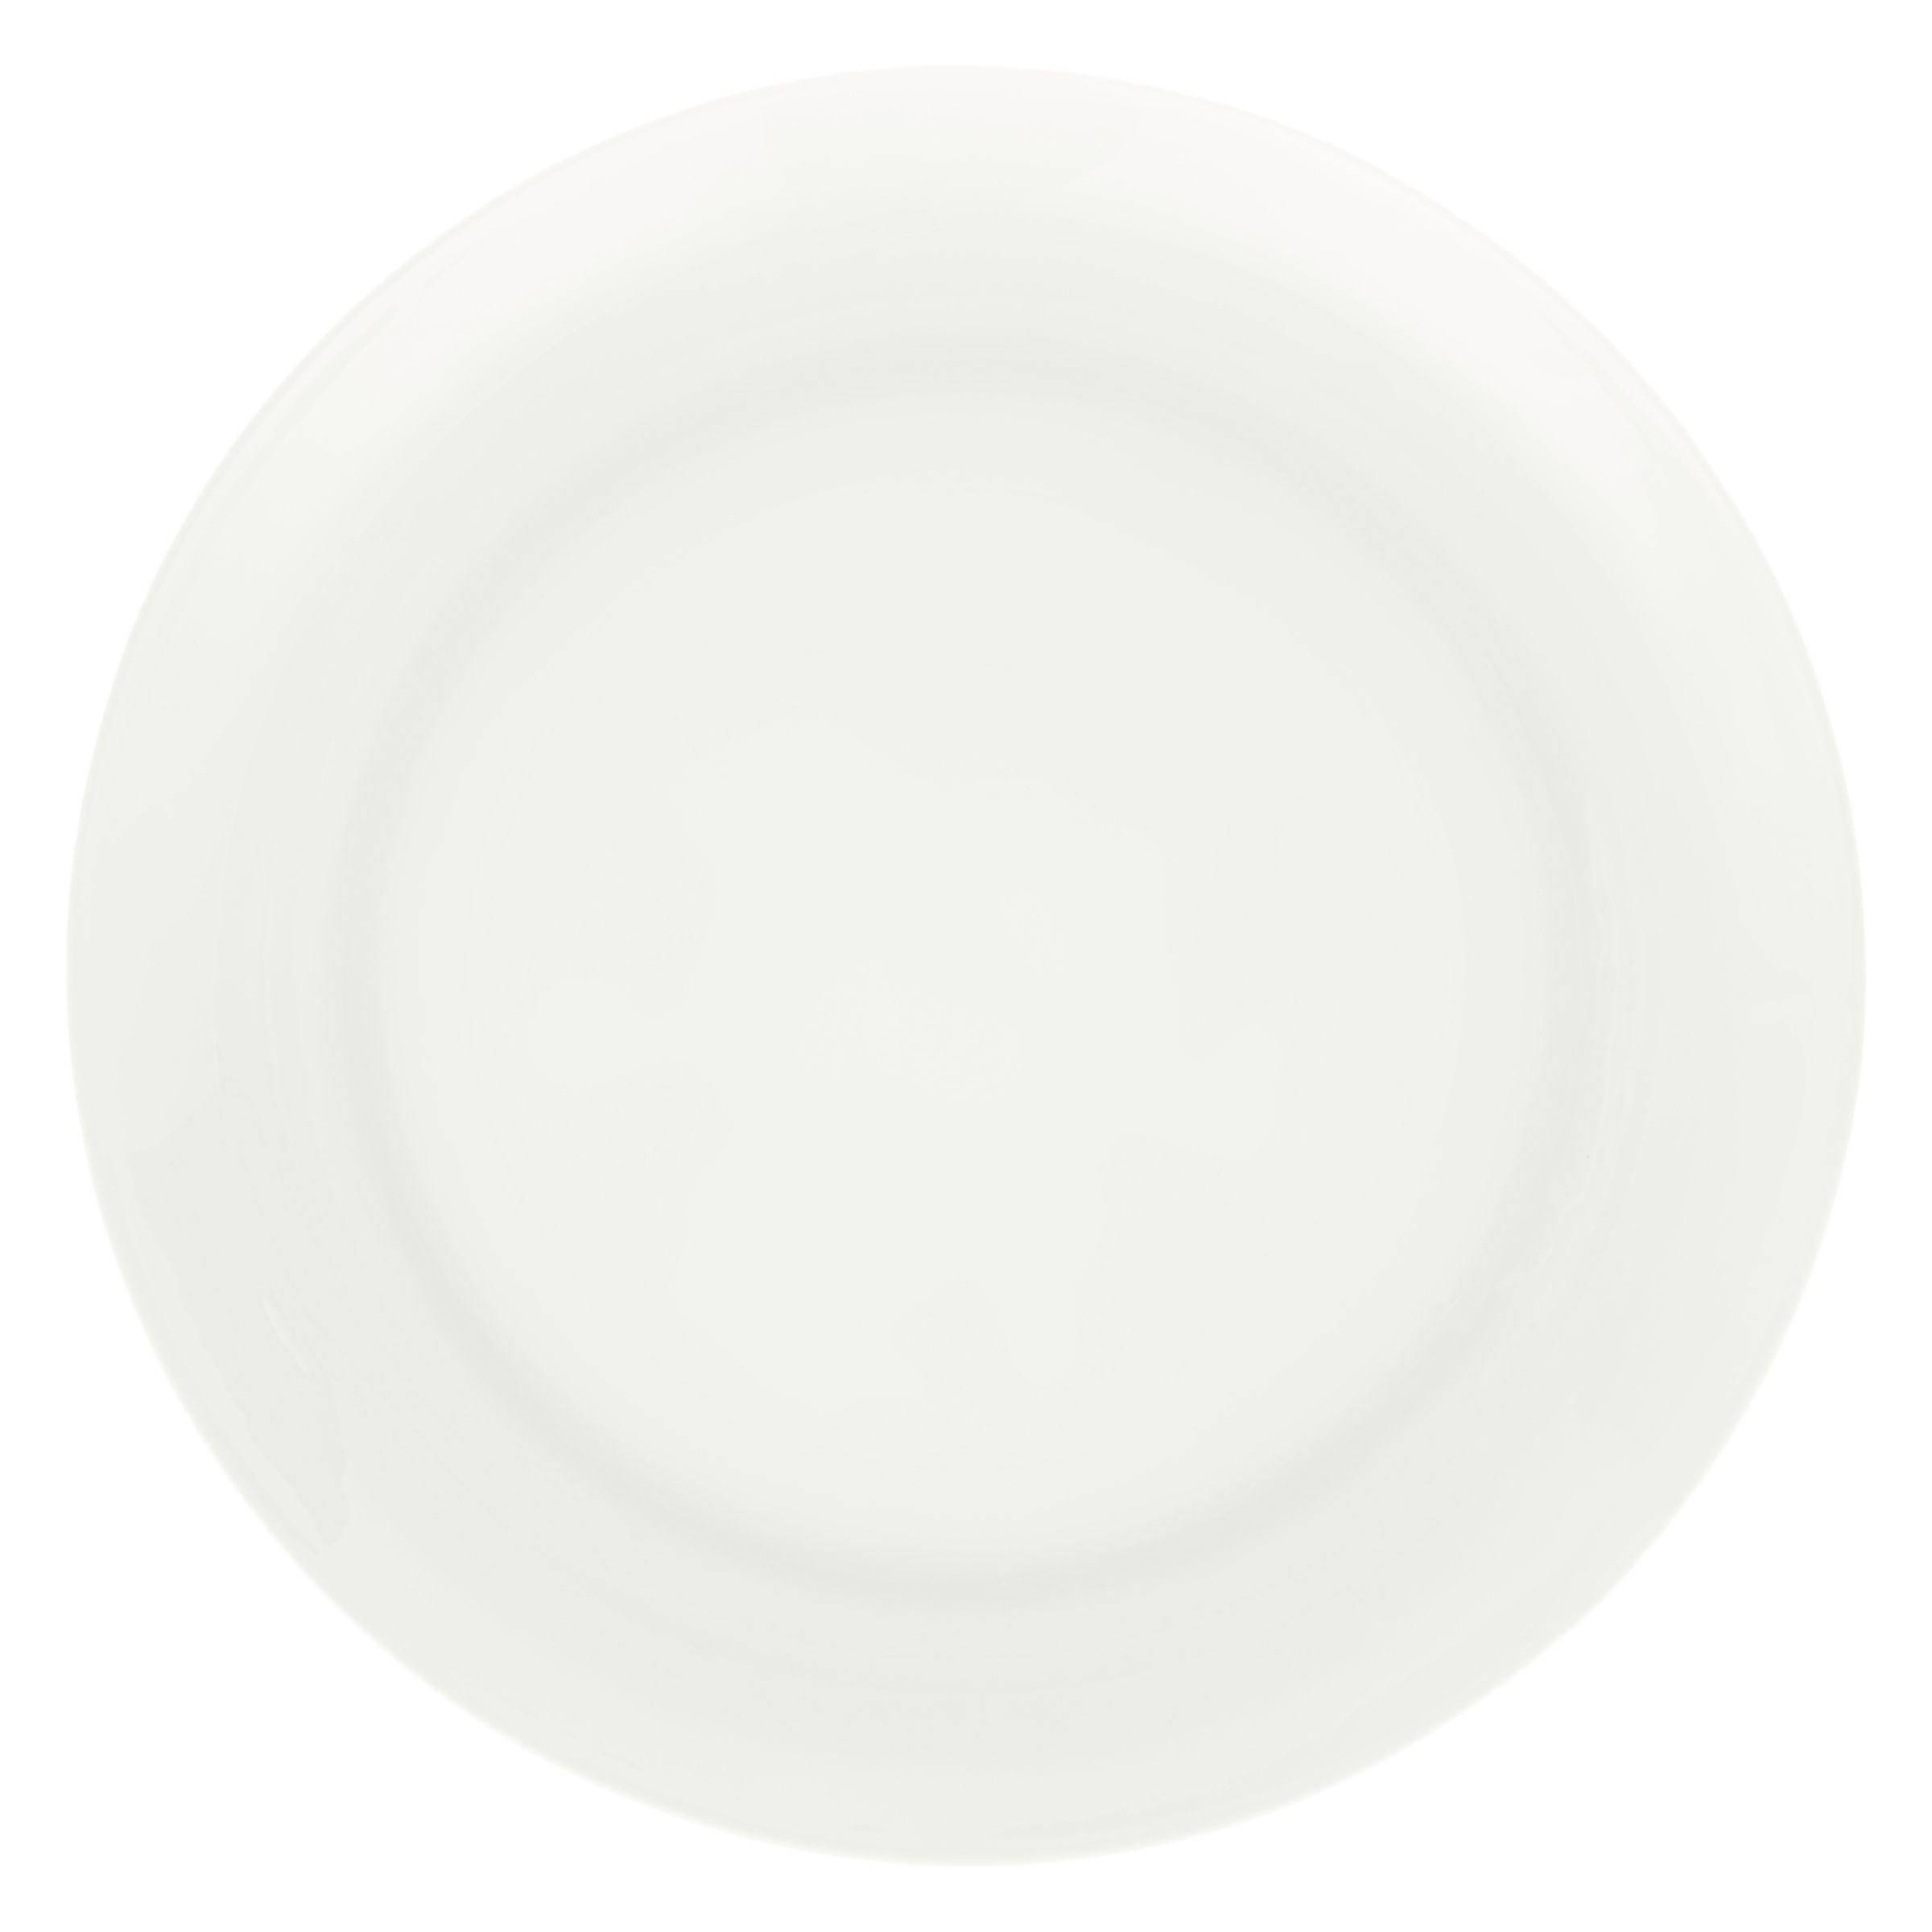 Cornishware John Lewis Contour Bone China 27.5cm Plate, White